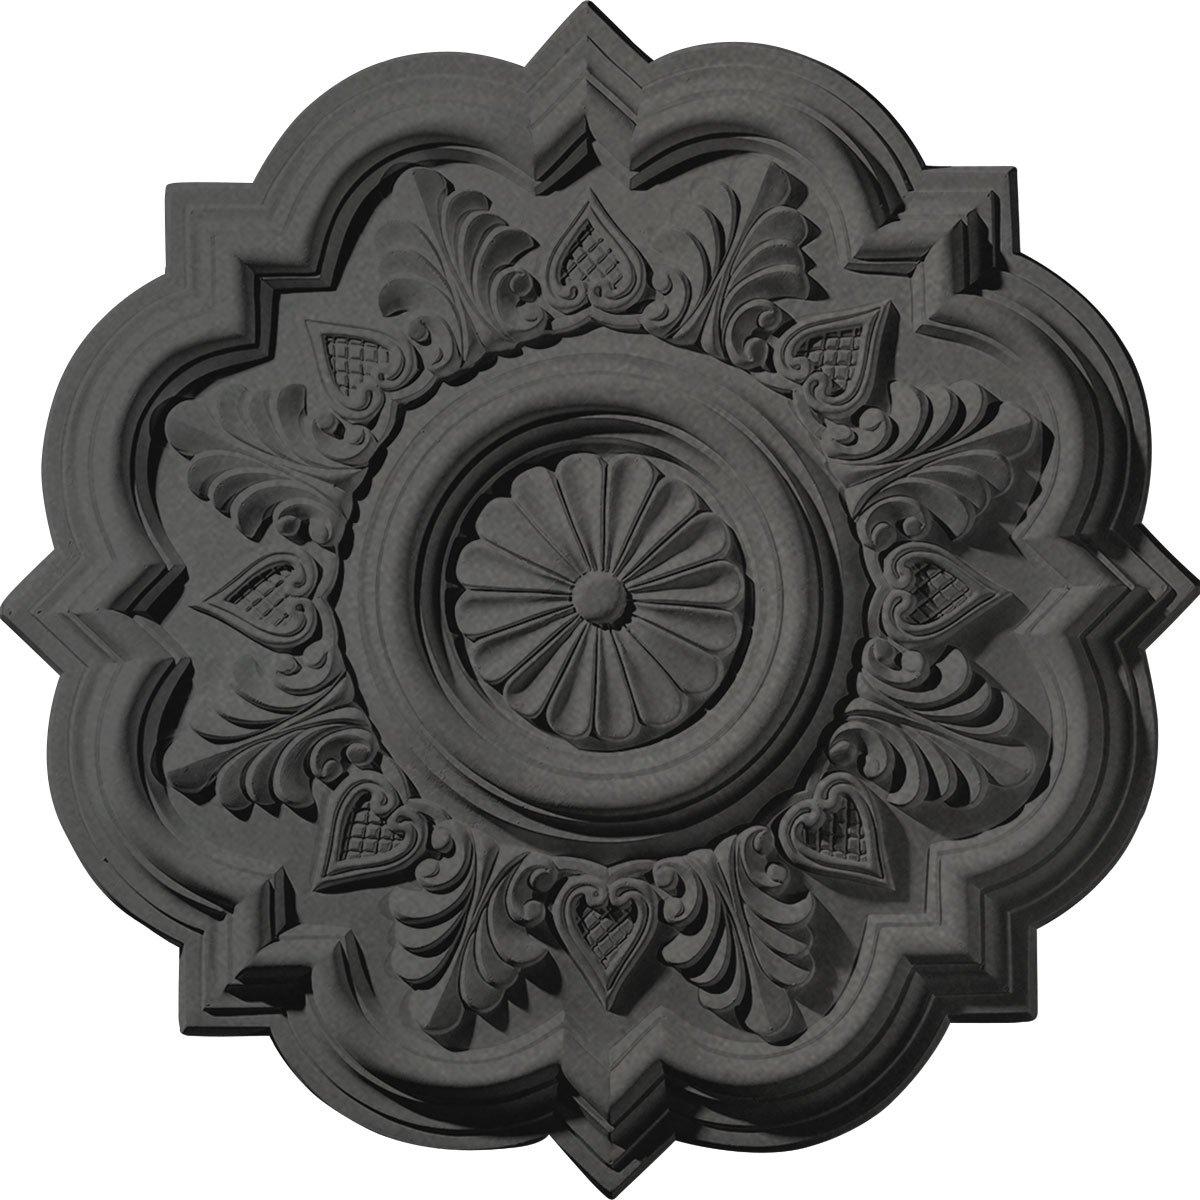 Ekena Millwork CM20DRSGS Deria Ceiling Medallion fits Canopies up to 6'', Steel Gray